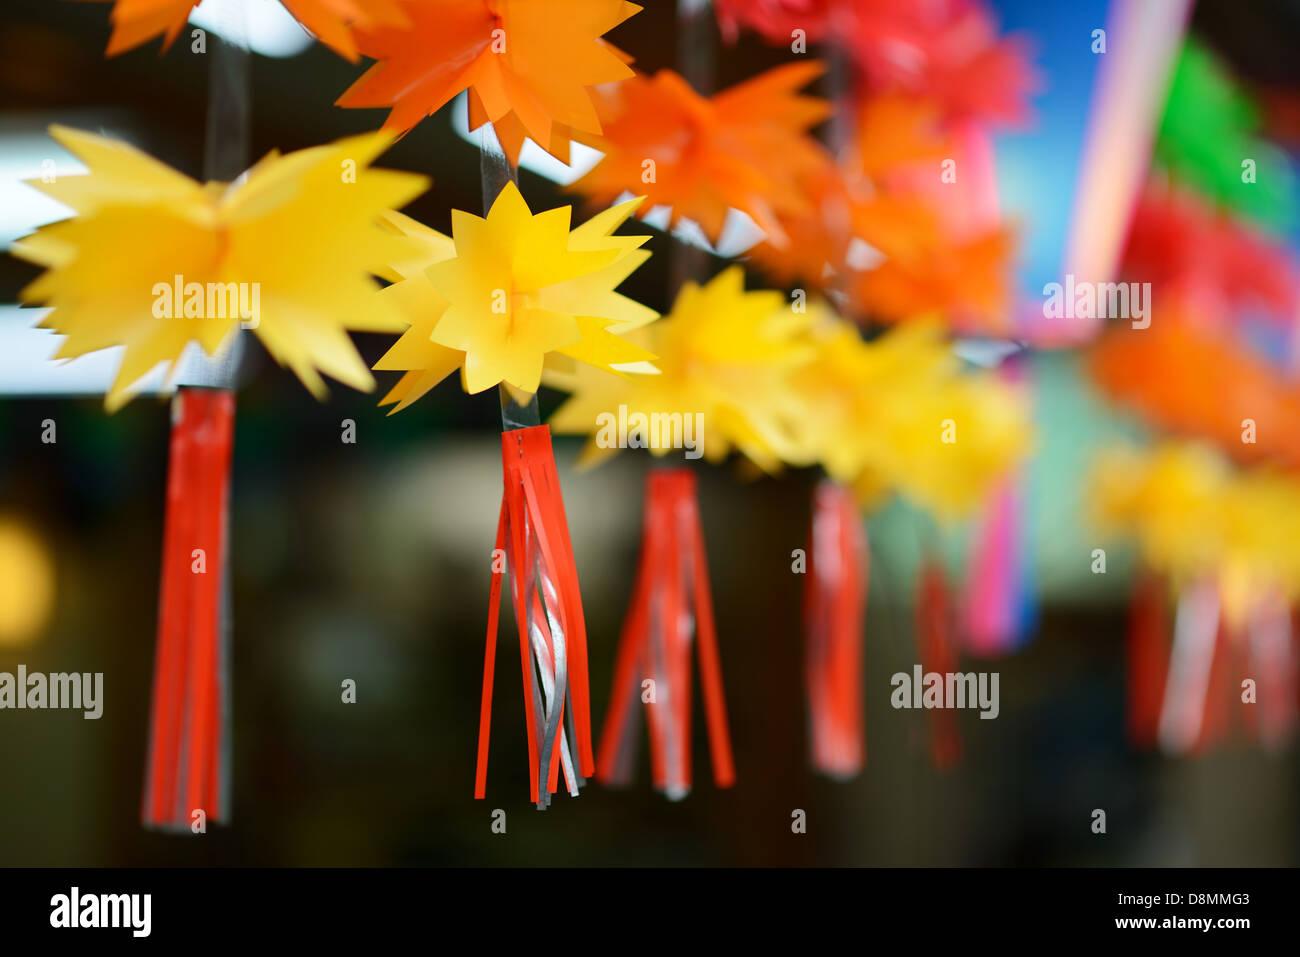 Fresare decorative appese a Narita, in Giappone Immagini Stock